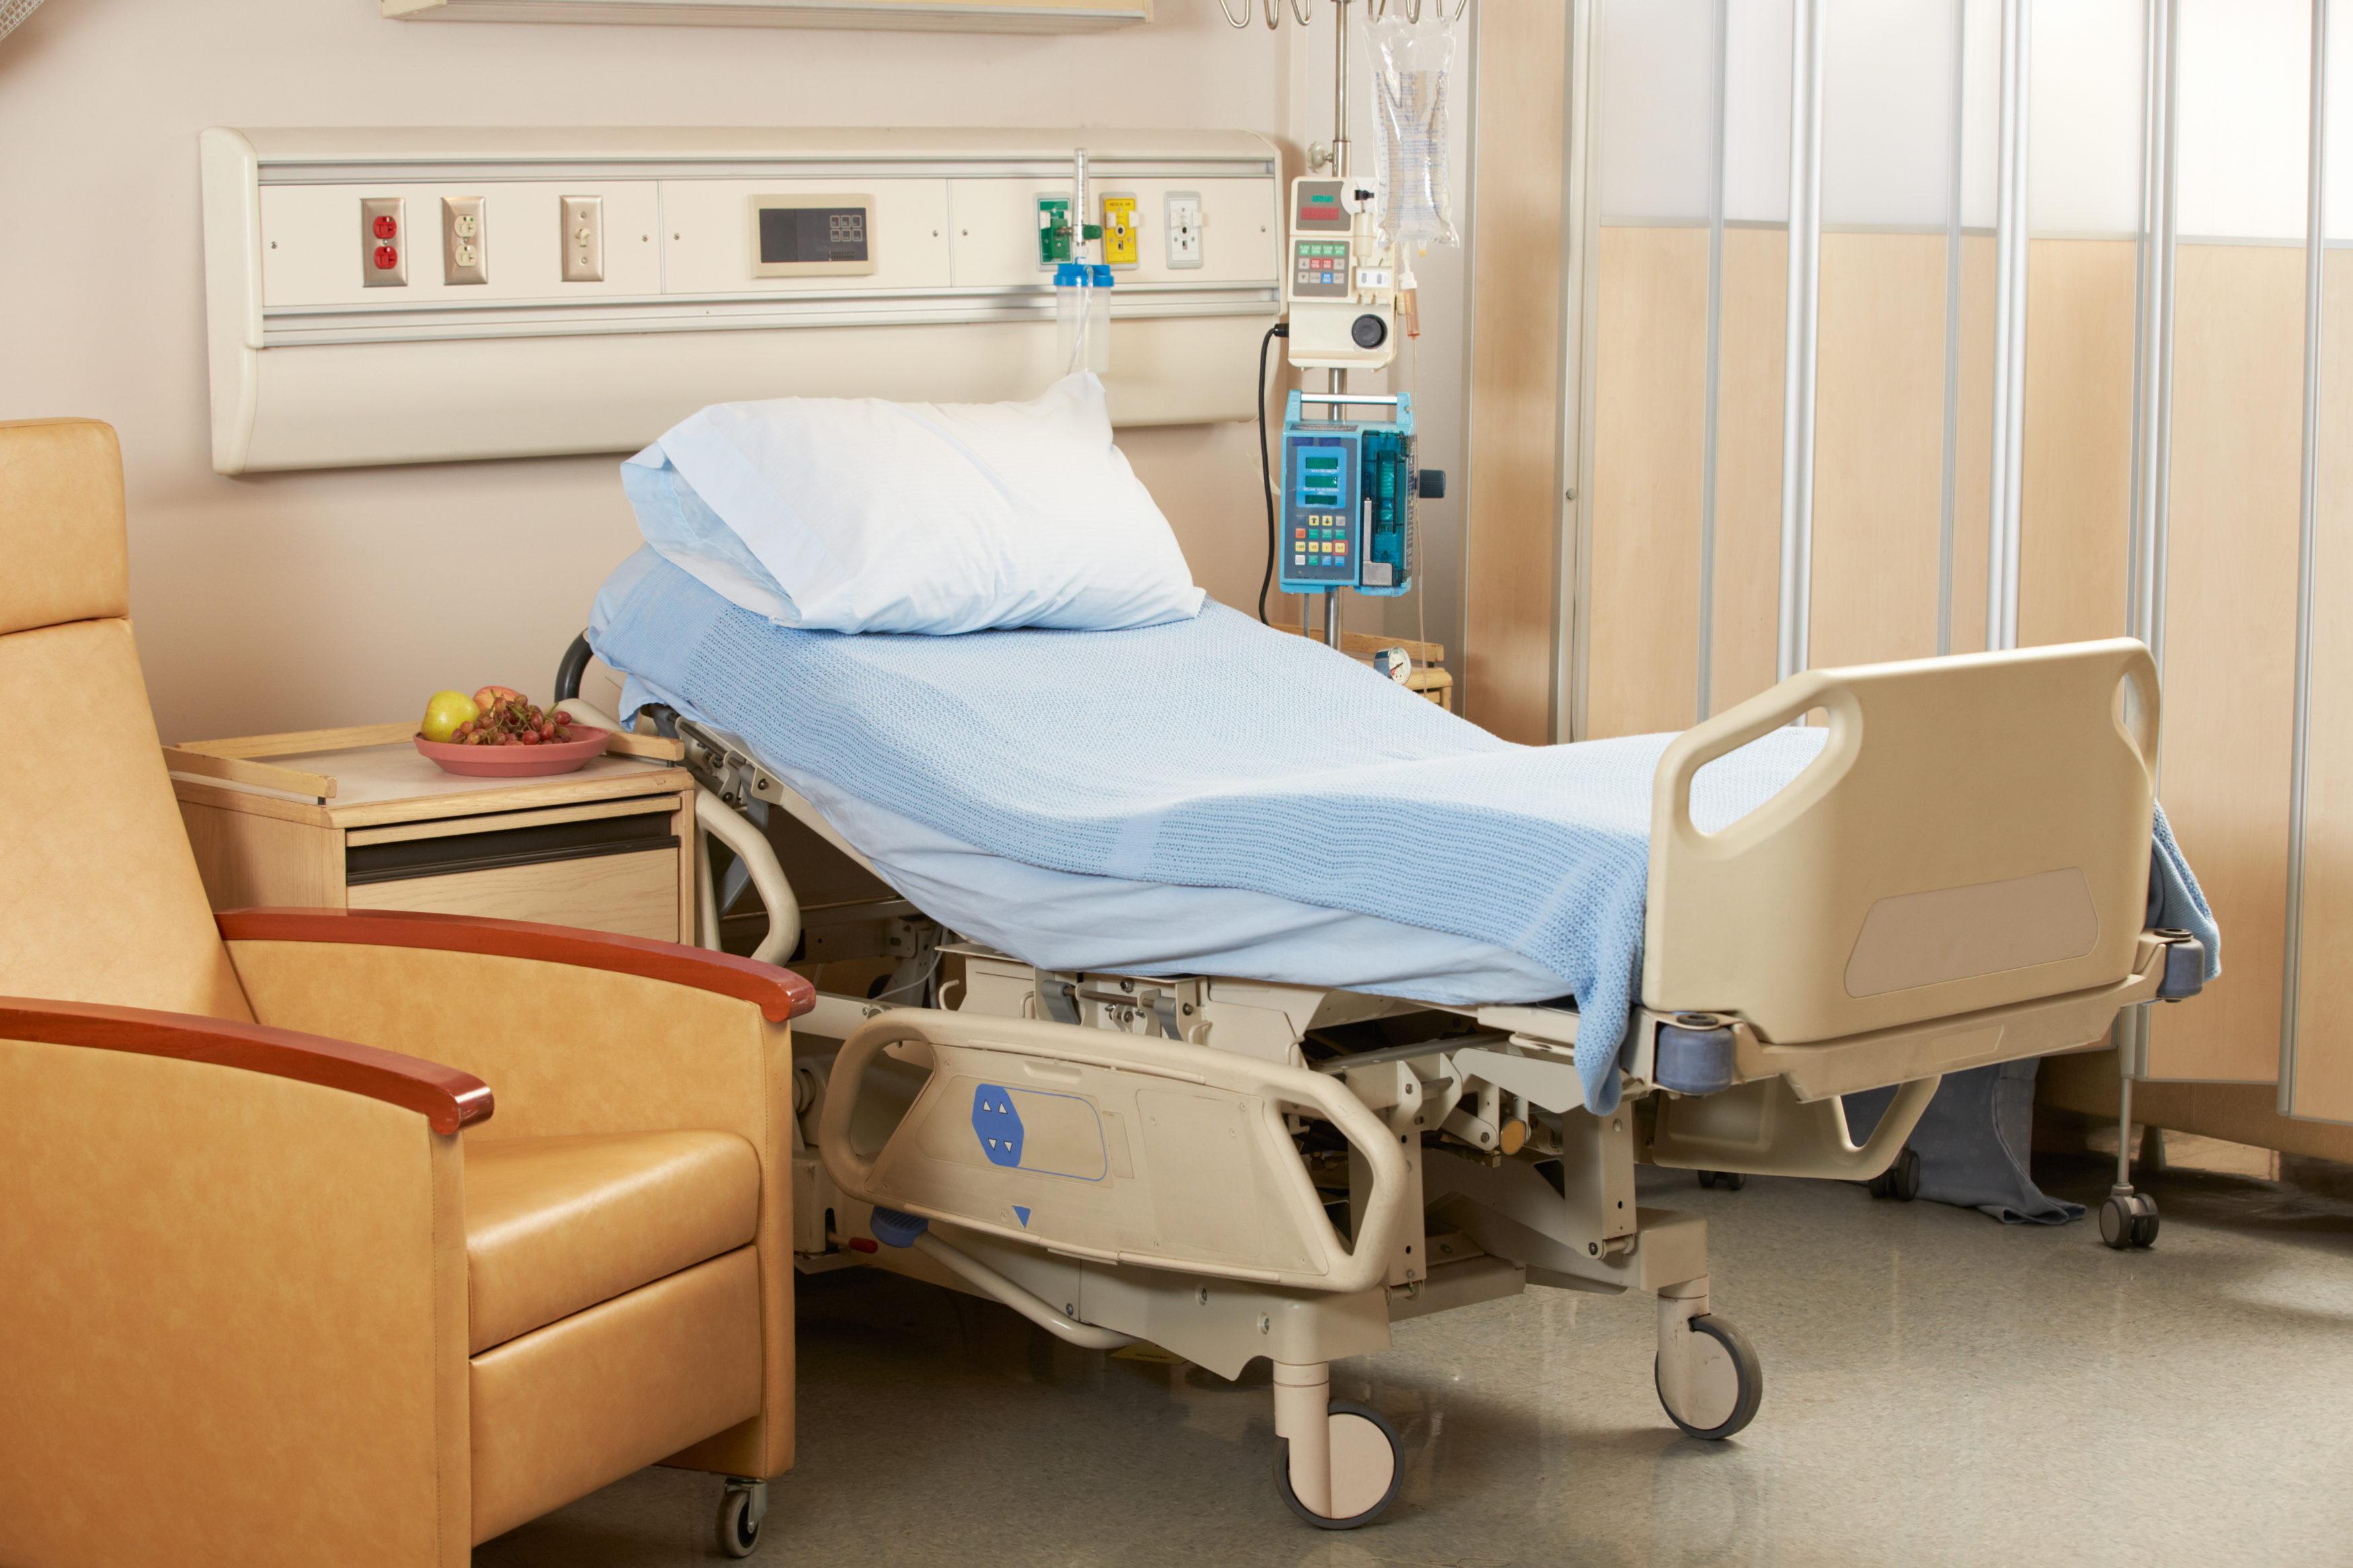 hospital-bed-3500x2333.jpg